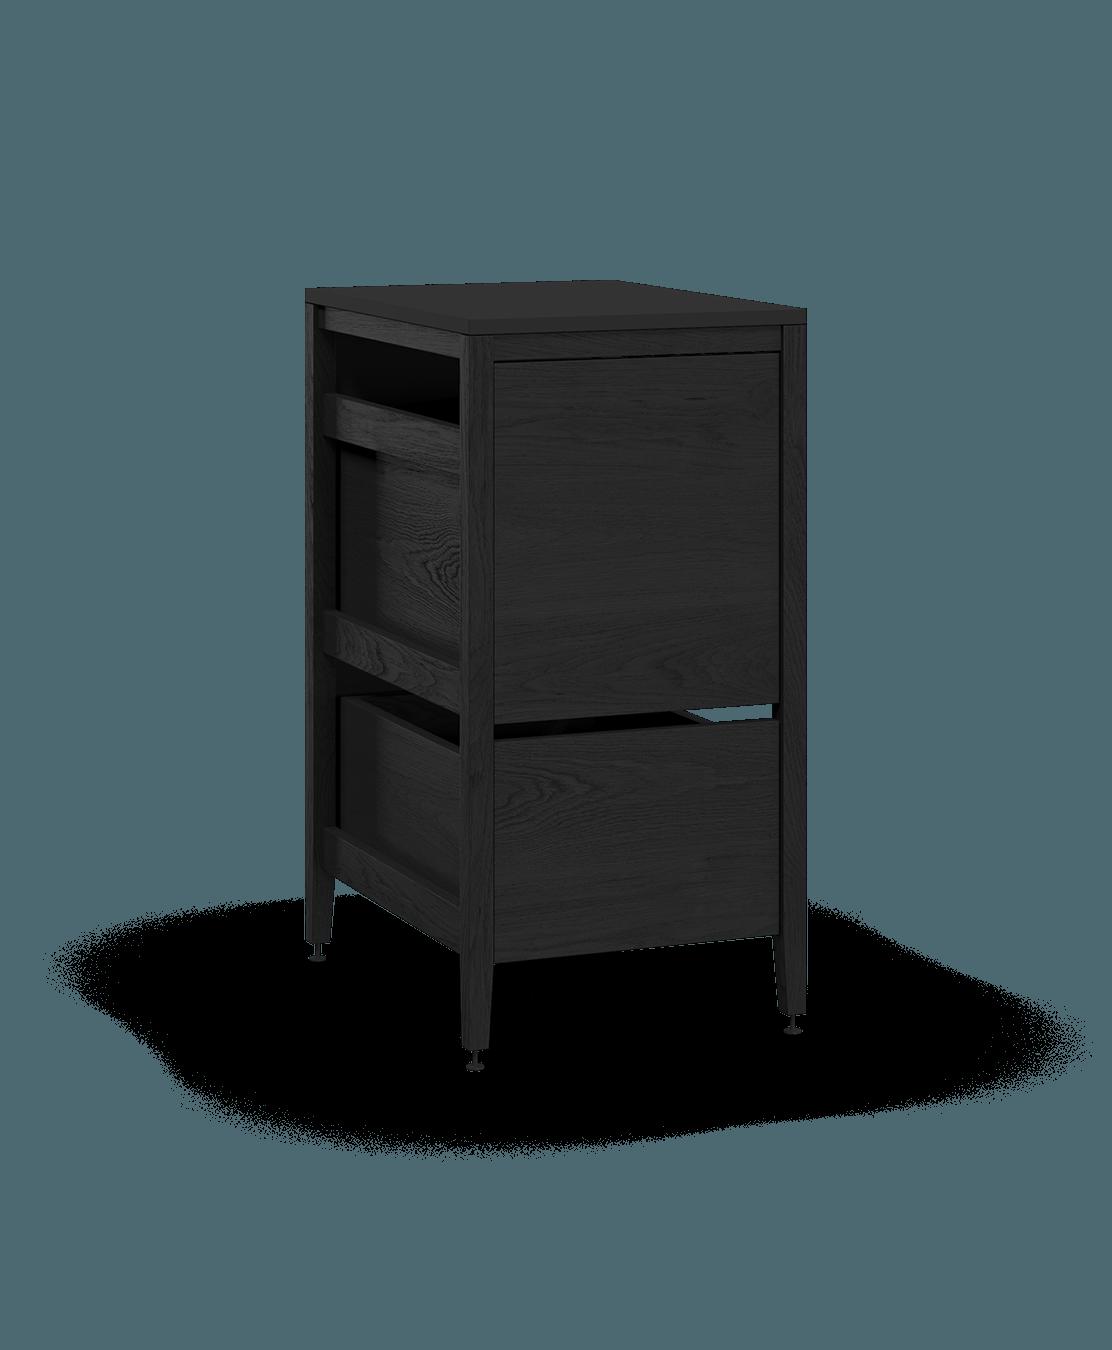 coquo radix midnight black stained oak solid wood modular 1 drawer 2 bins trash base kitchen cabinet 18 inch C1-CTR-18TB-2002-BK